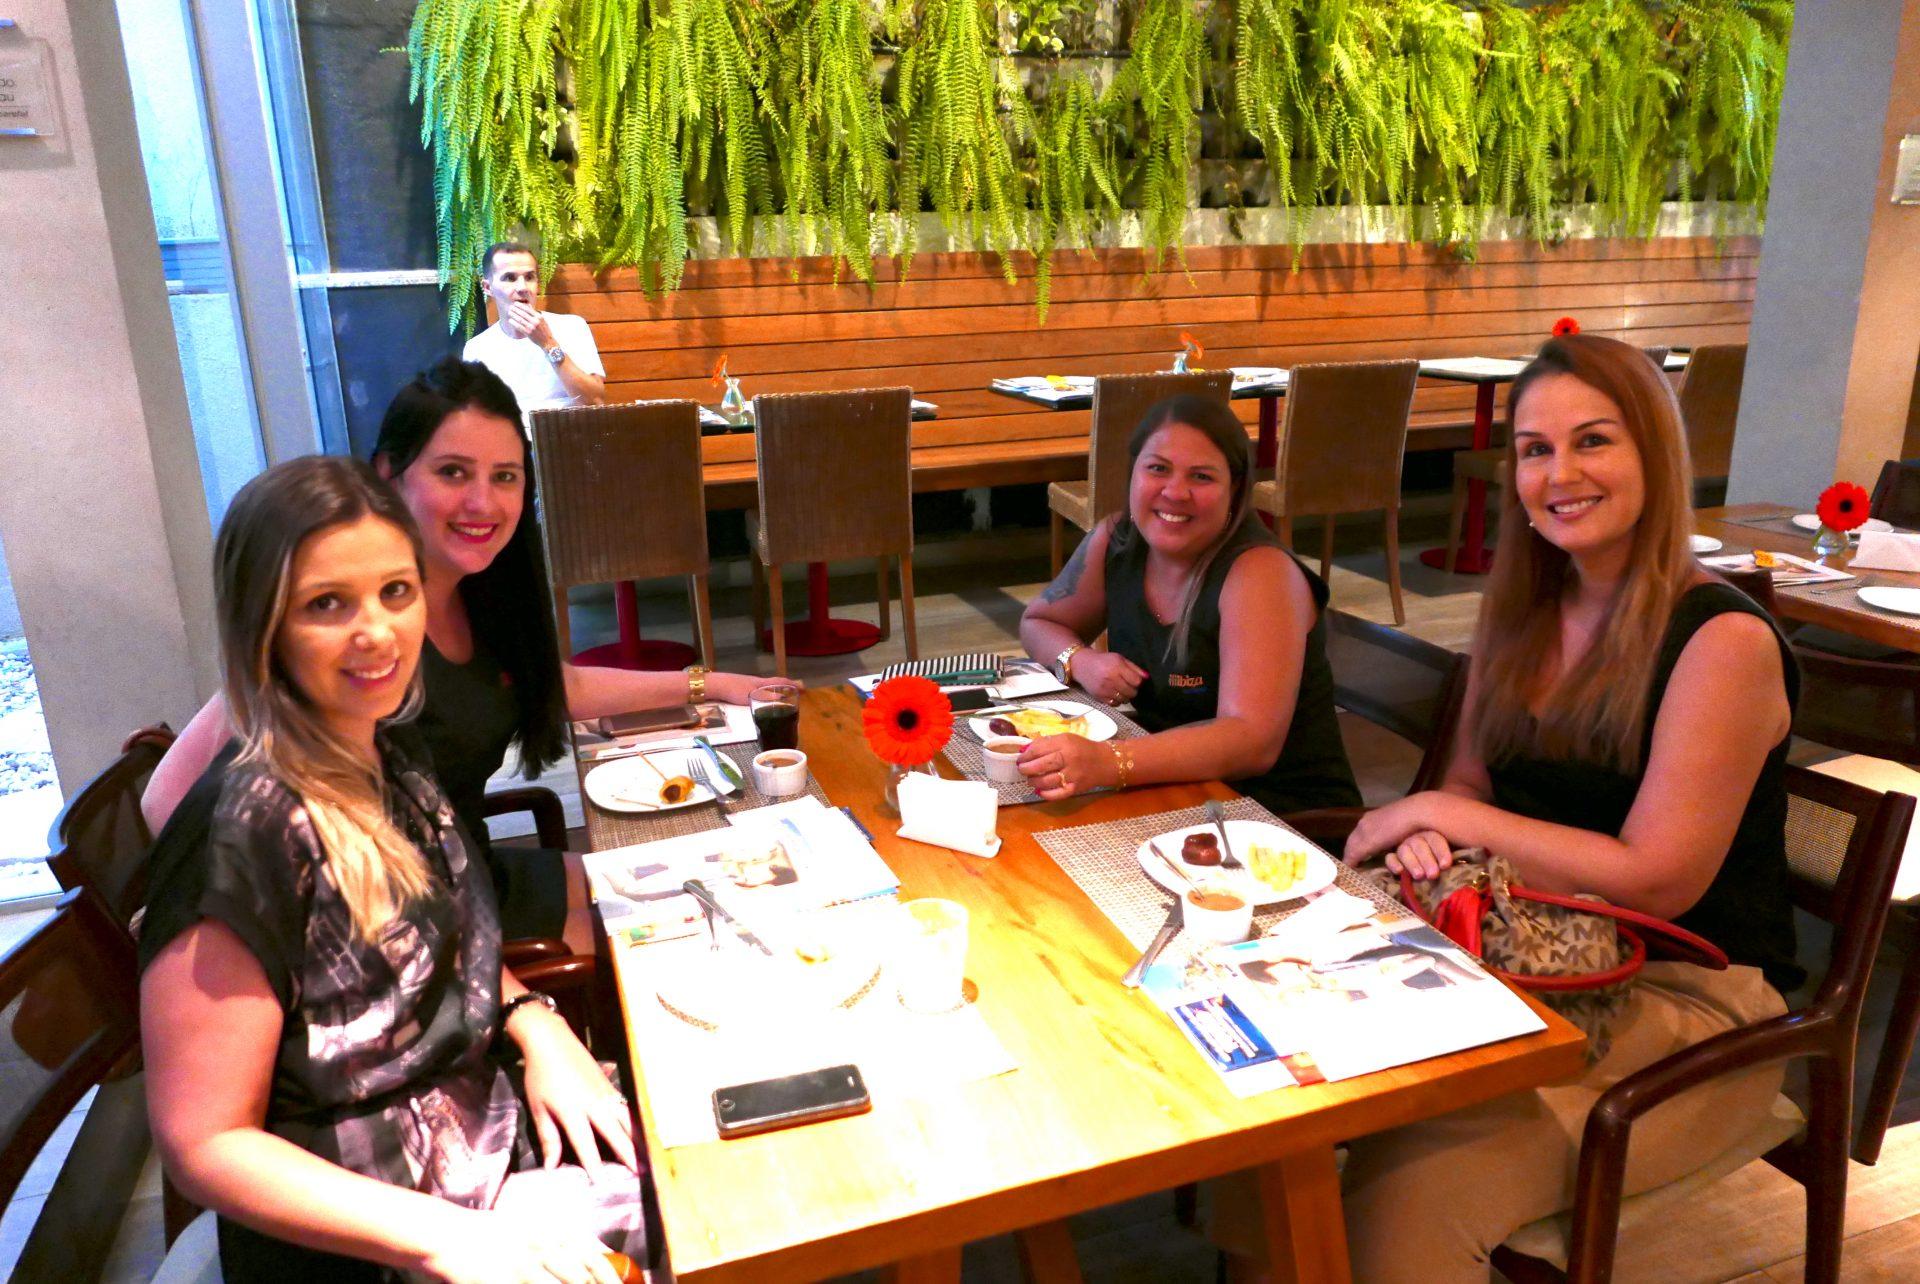 Daniele Starling, Juliana Machado, e Ana Paula Freitas, da Ibiza Turismo; com Ludmila Meireles, da Tour Le Monde